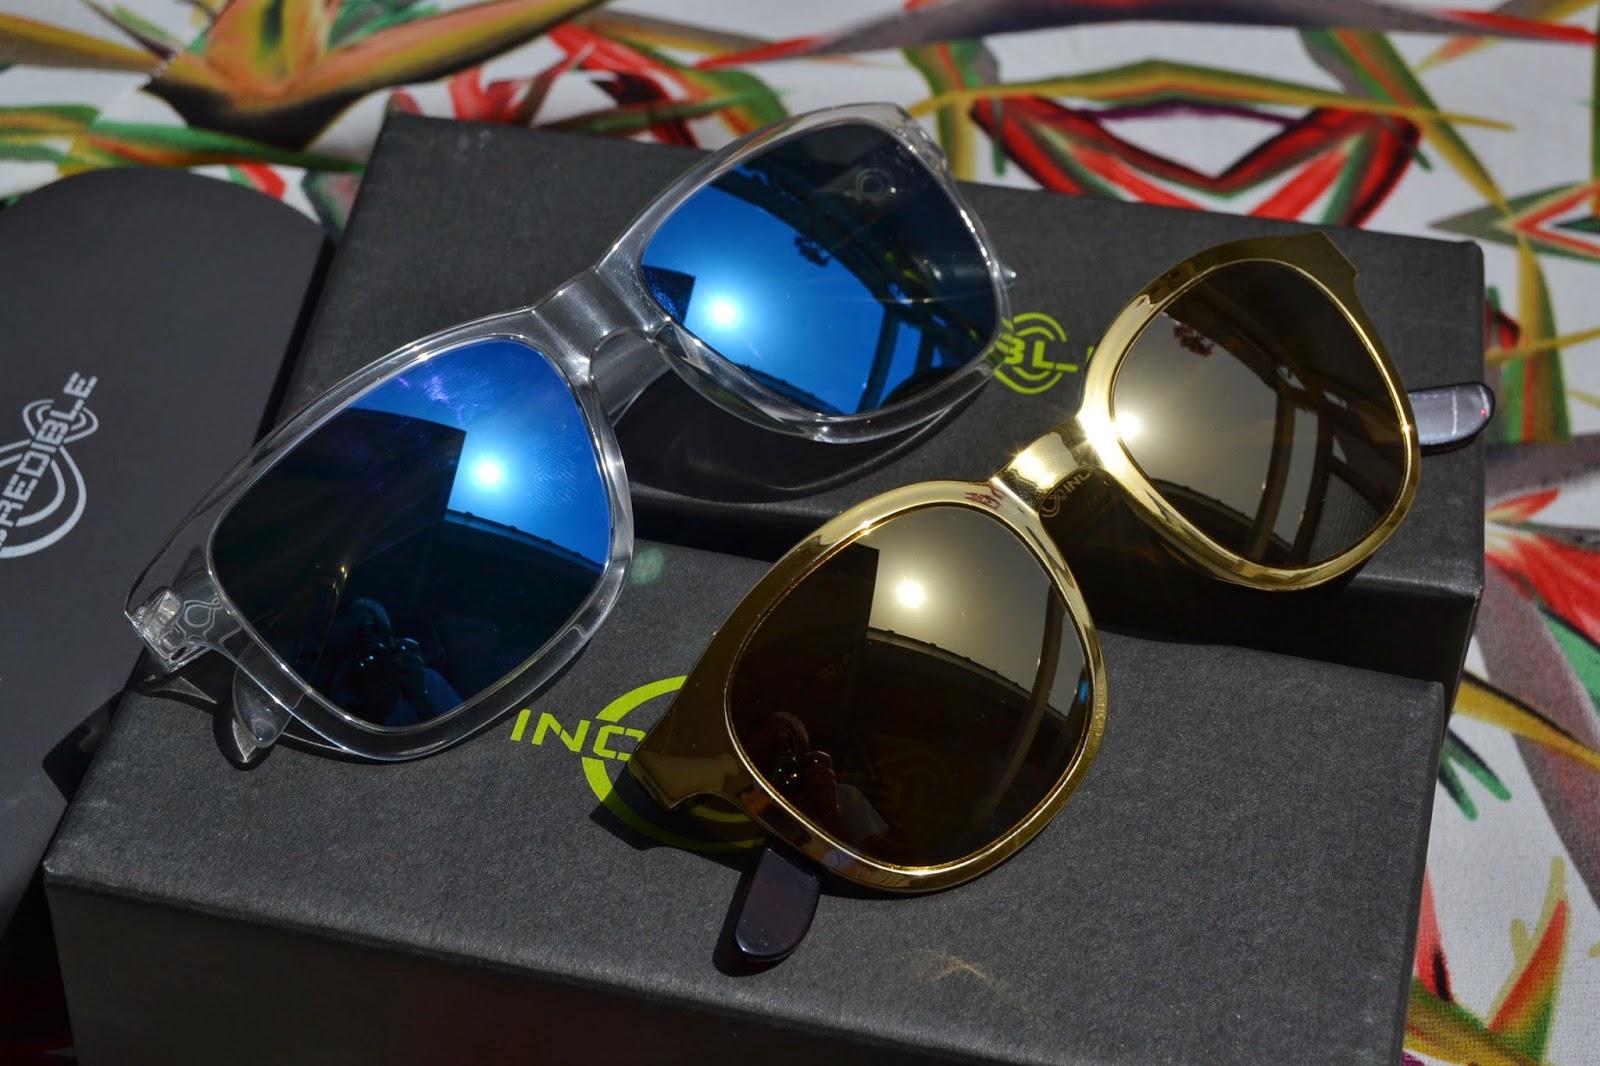 http://www.syriouslyinfashion.com/2014/07/incredible-real-italian-sunglasses.html